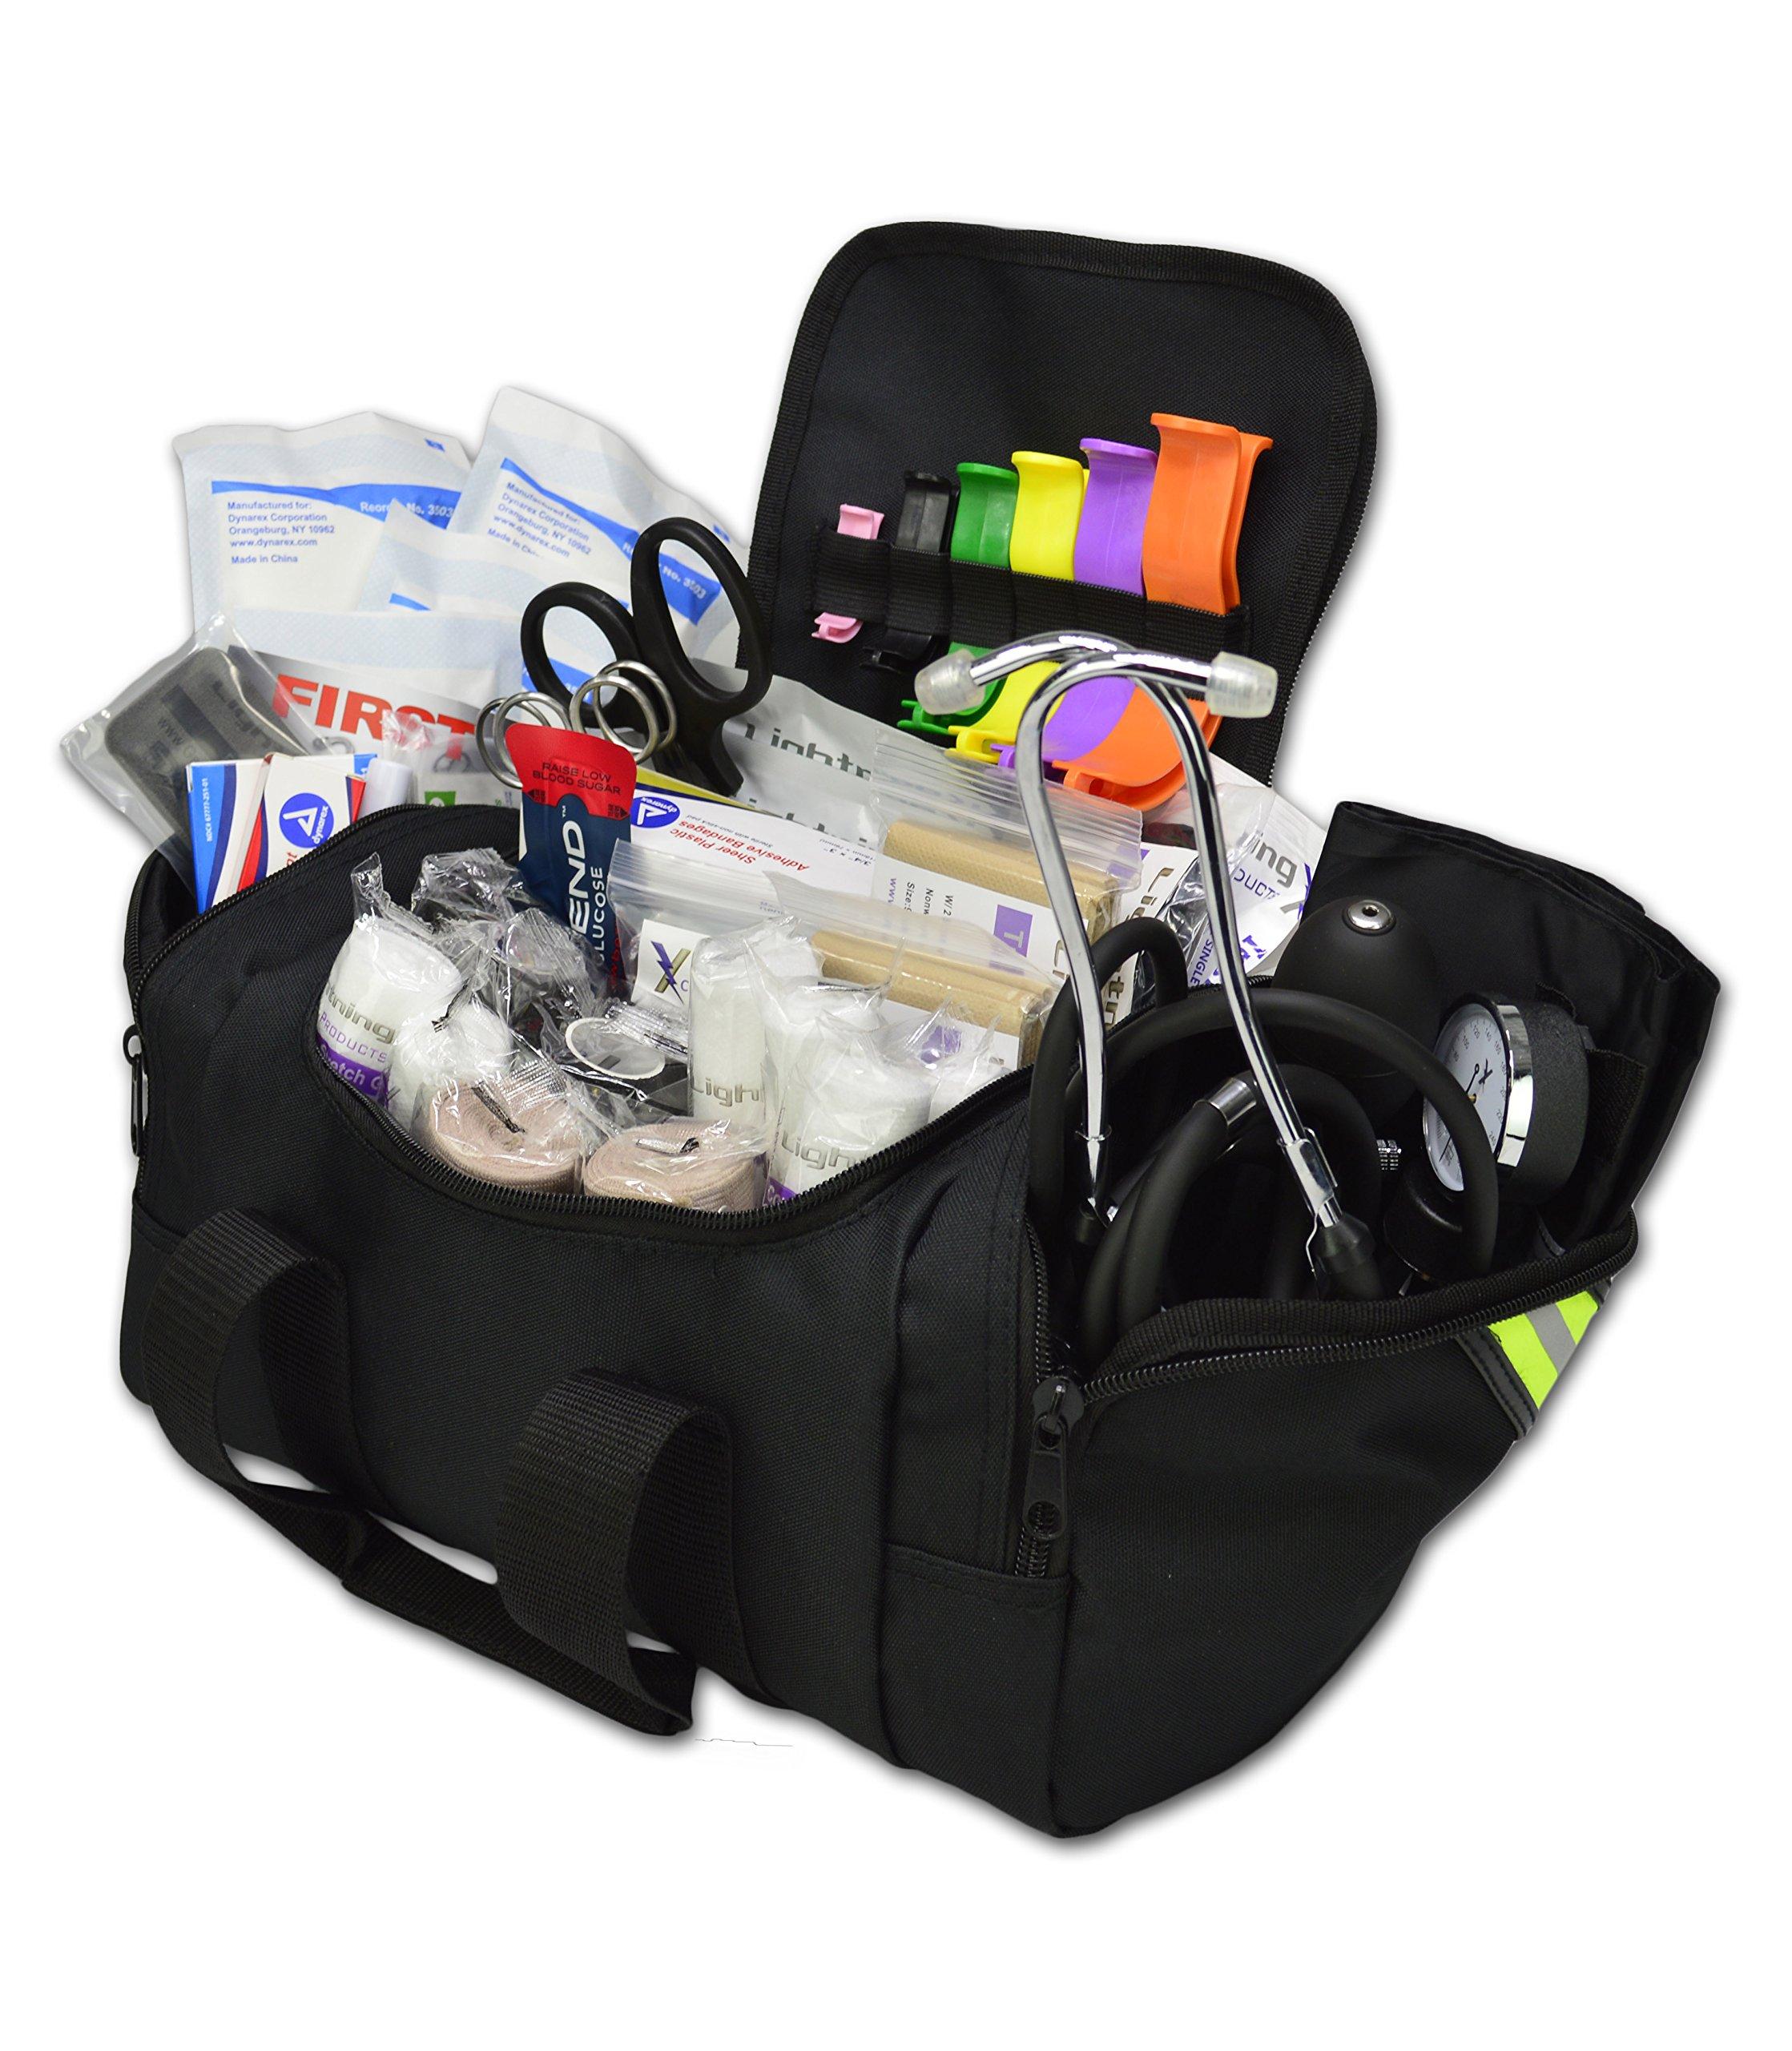 Lightning X Value Compact Medic First Responder EMS/EMT Stocked Trauma Bag w/Standard Fill Kit B - Black